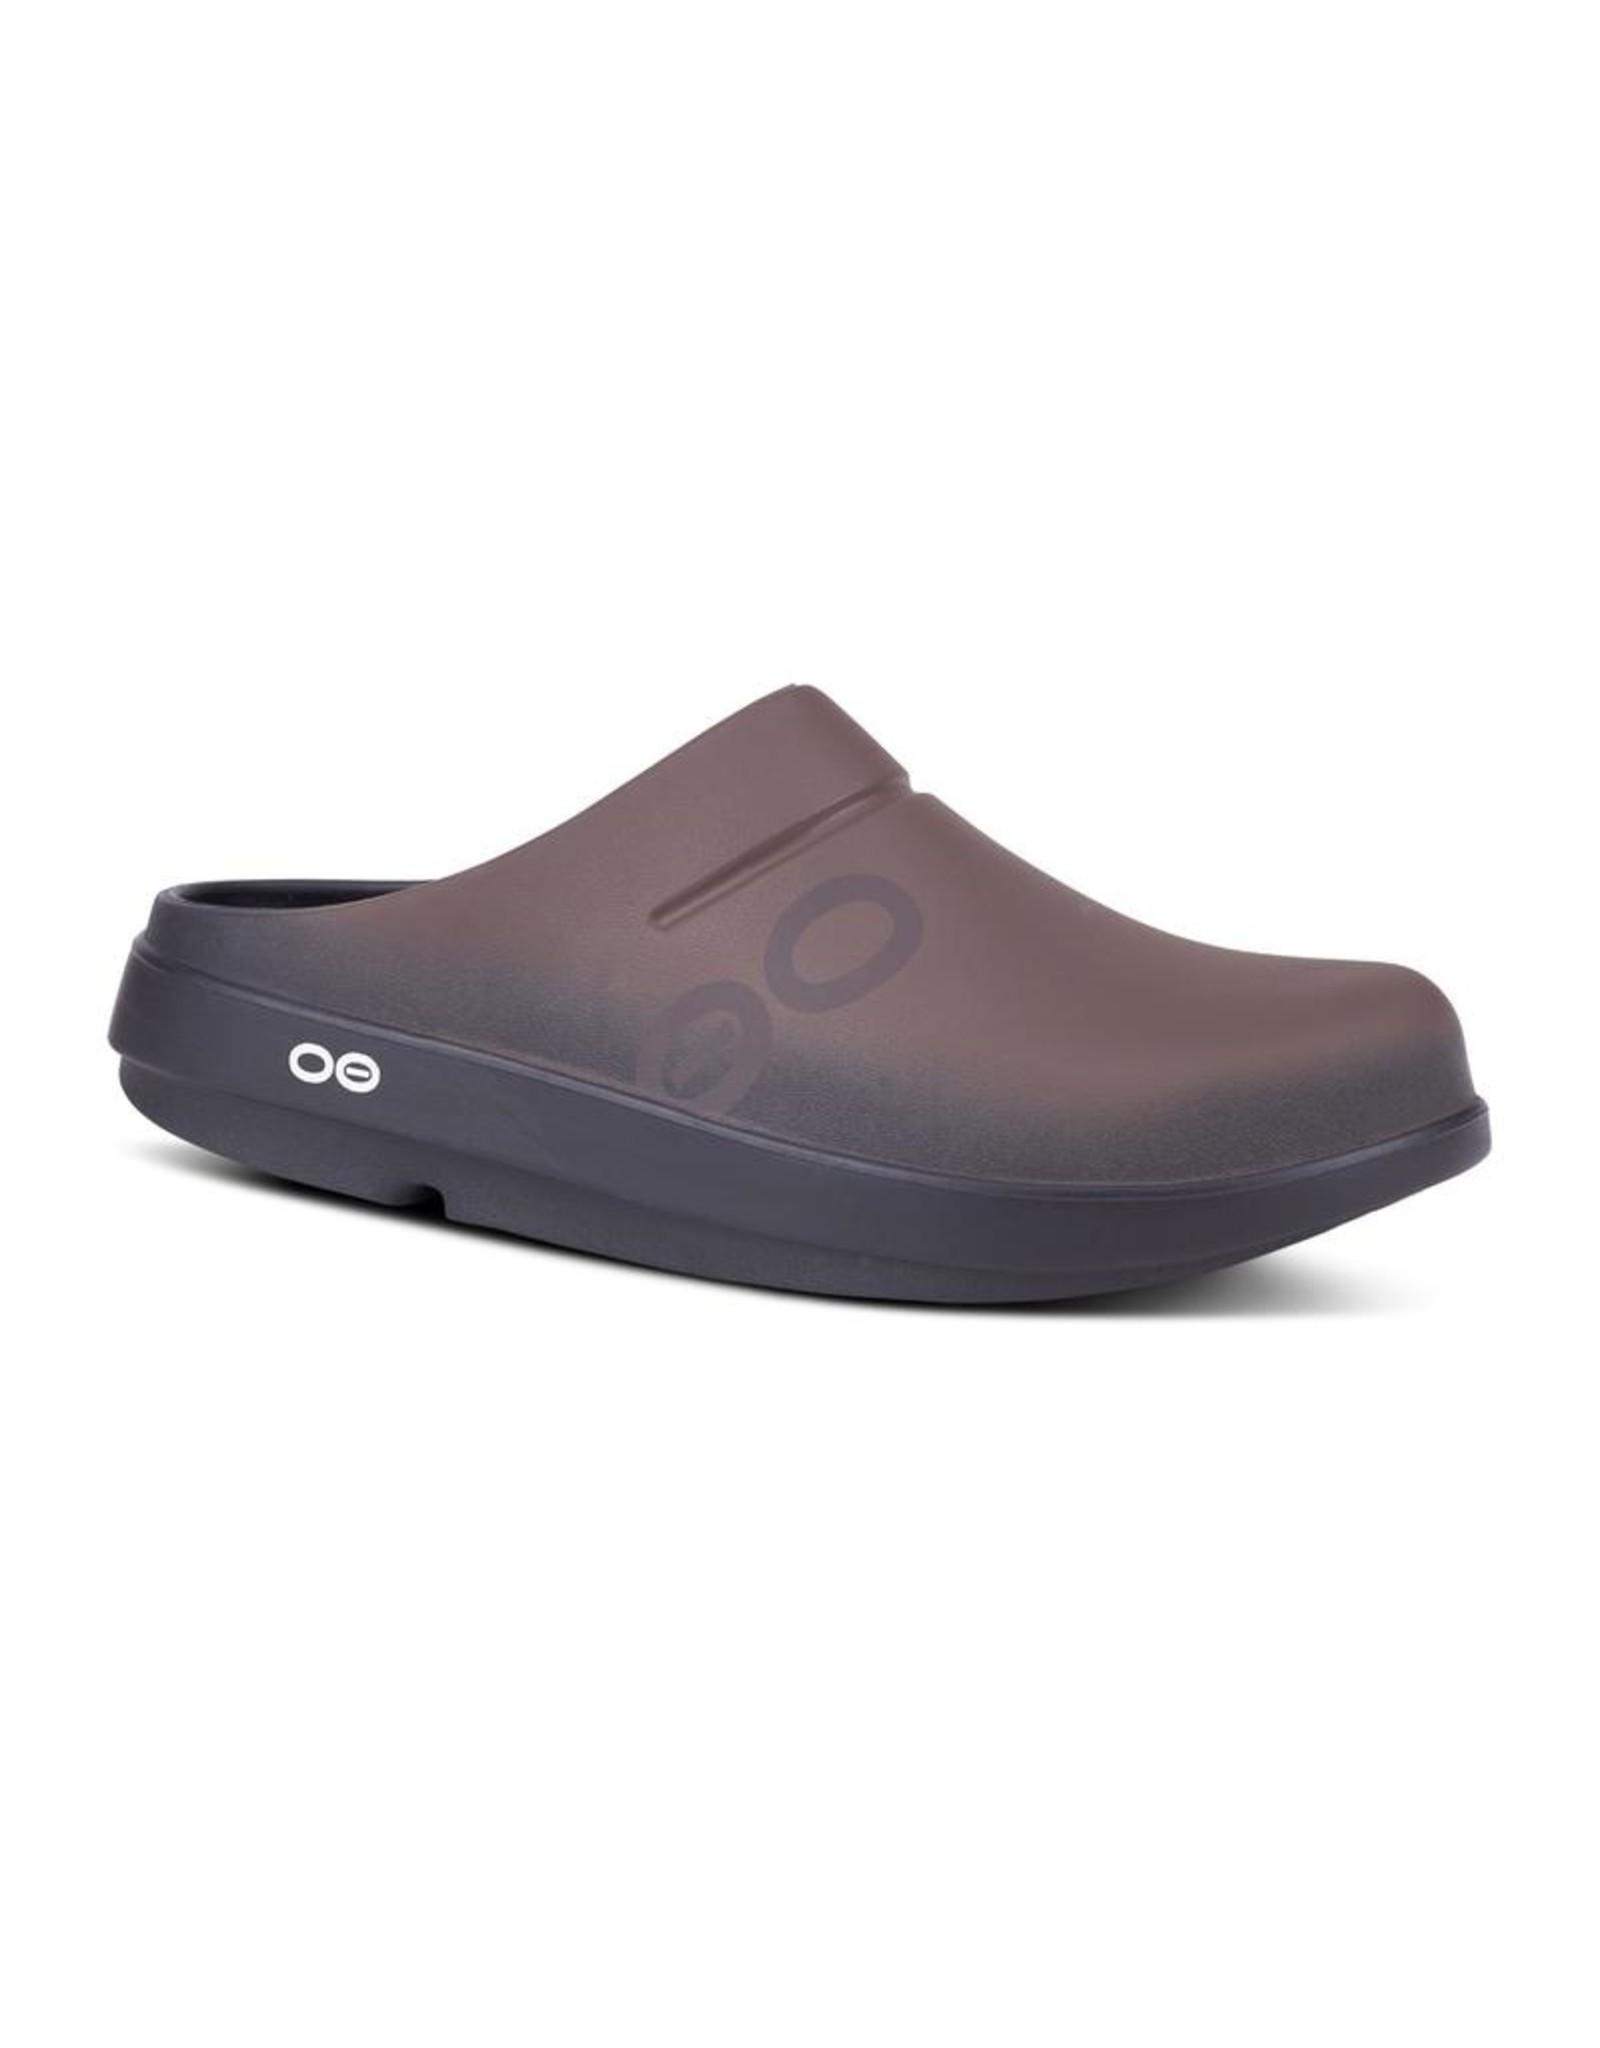 OOFOS OOCLOOG SPORT CLOG-BROWN